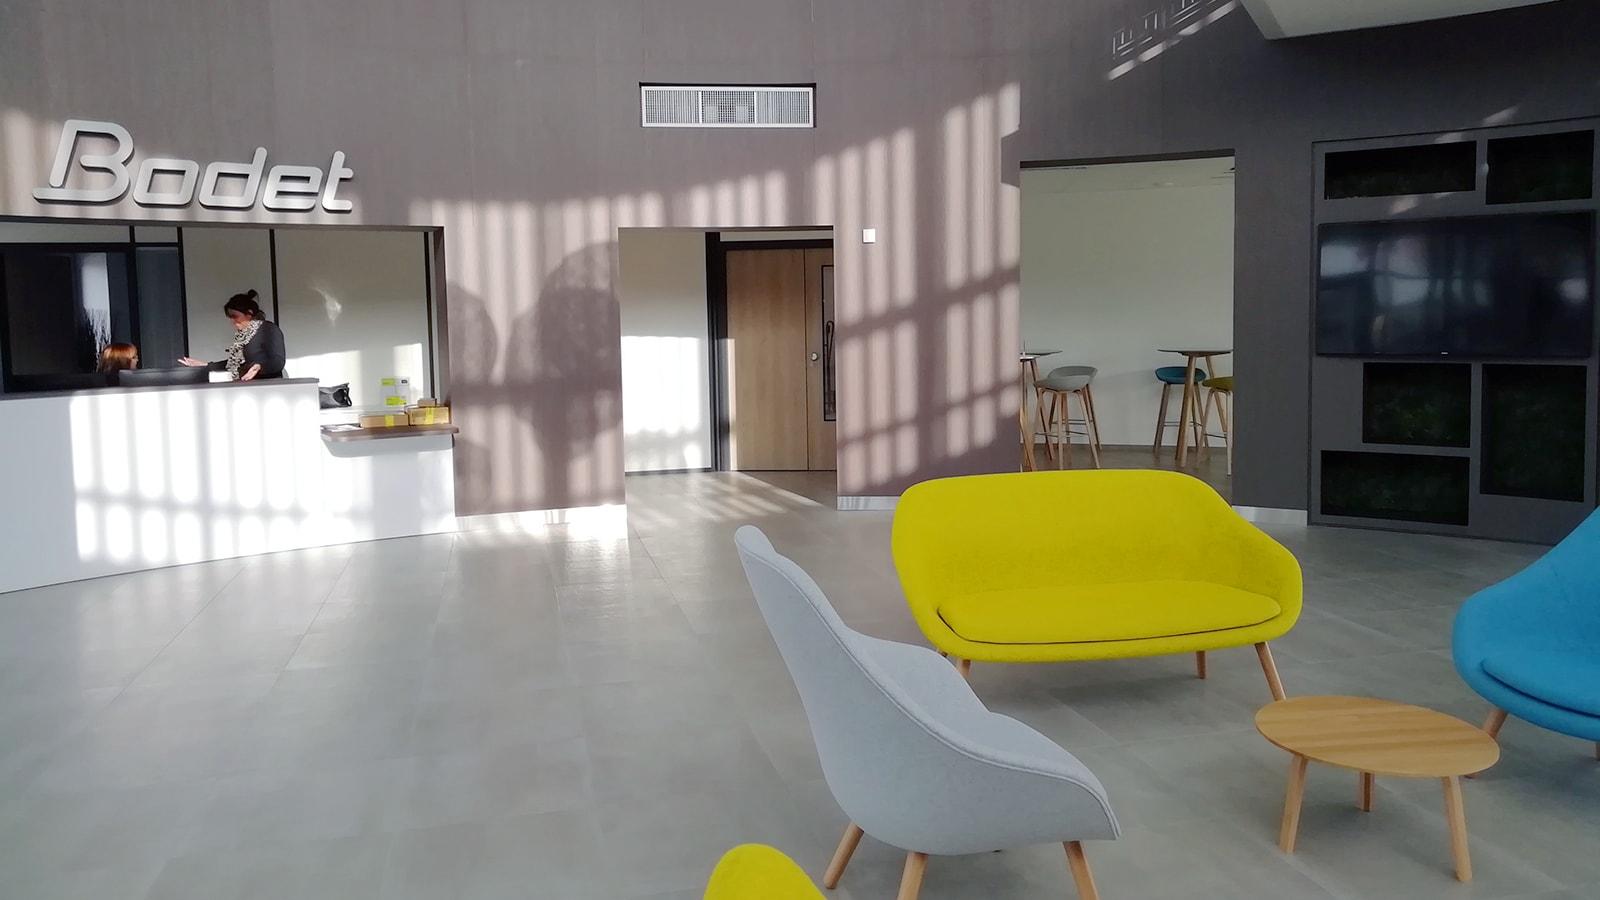 EFI Design Siège Social Bodet Cholet 1275